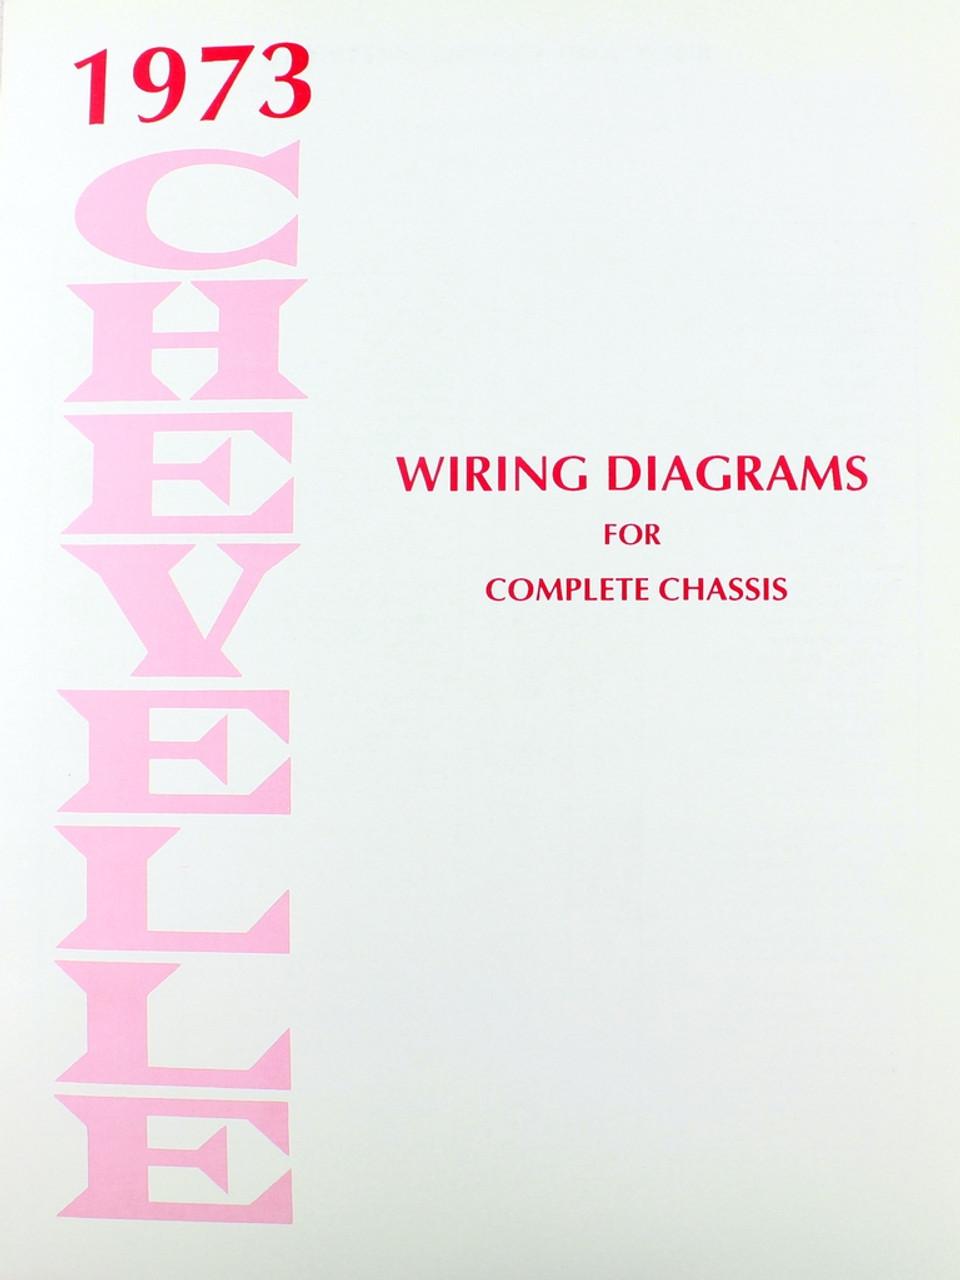 73 chevelle el camino electrical wiring diagram manual [ 768 x 1024 Pixel ]